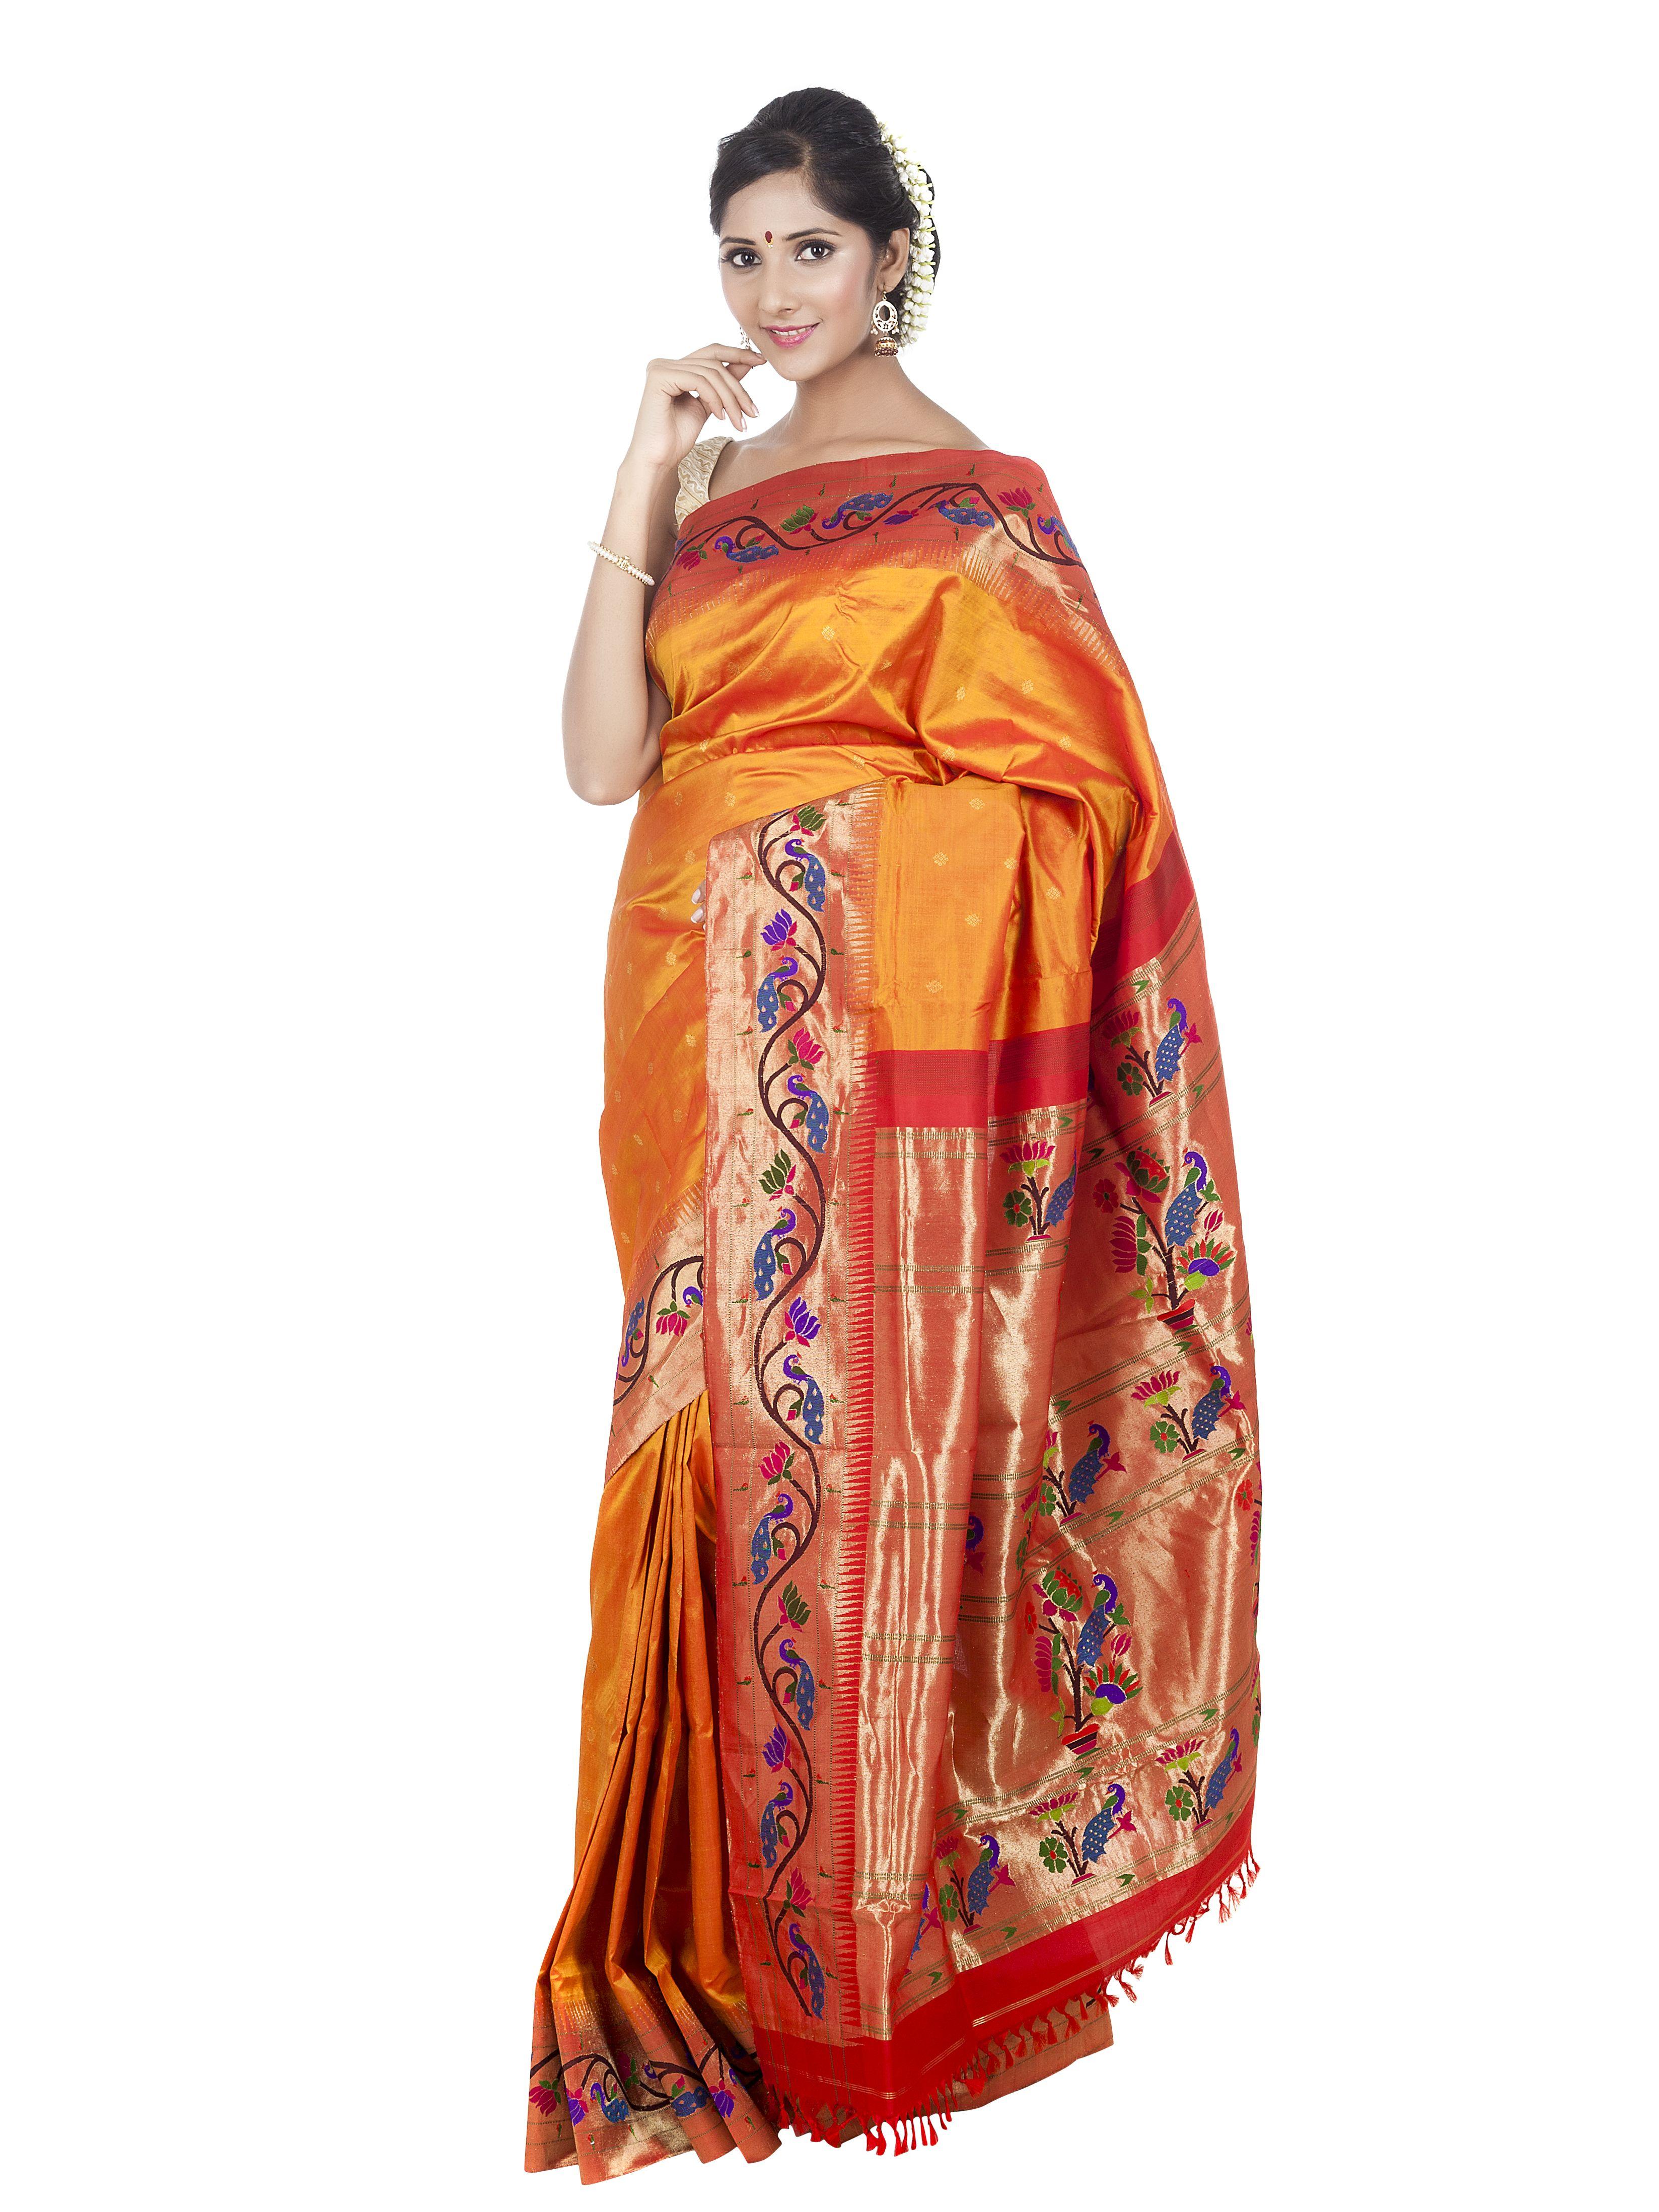 f99825dffb434 Golden Paithani saree with intricate peacock and lotus borders.  paithani   navratricolors  festival  traditionalsaree  handloomsaree  designersaree